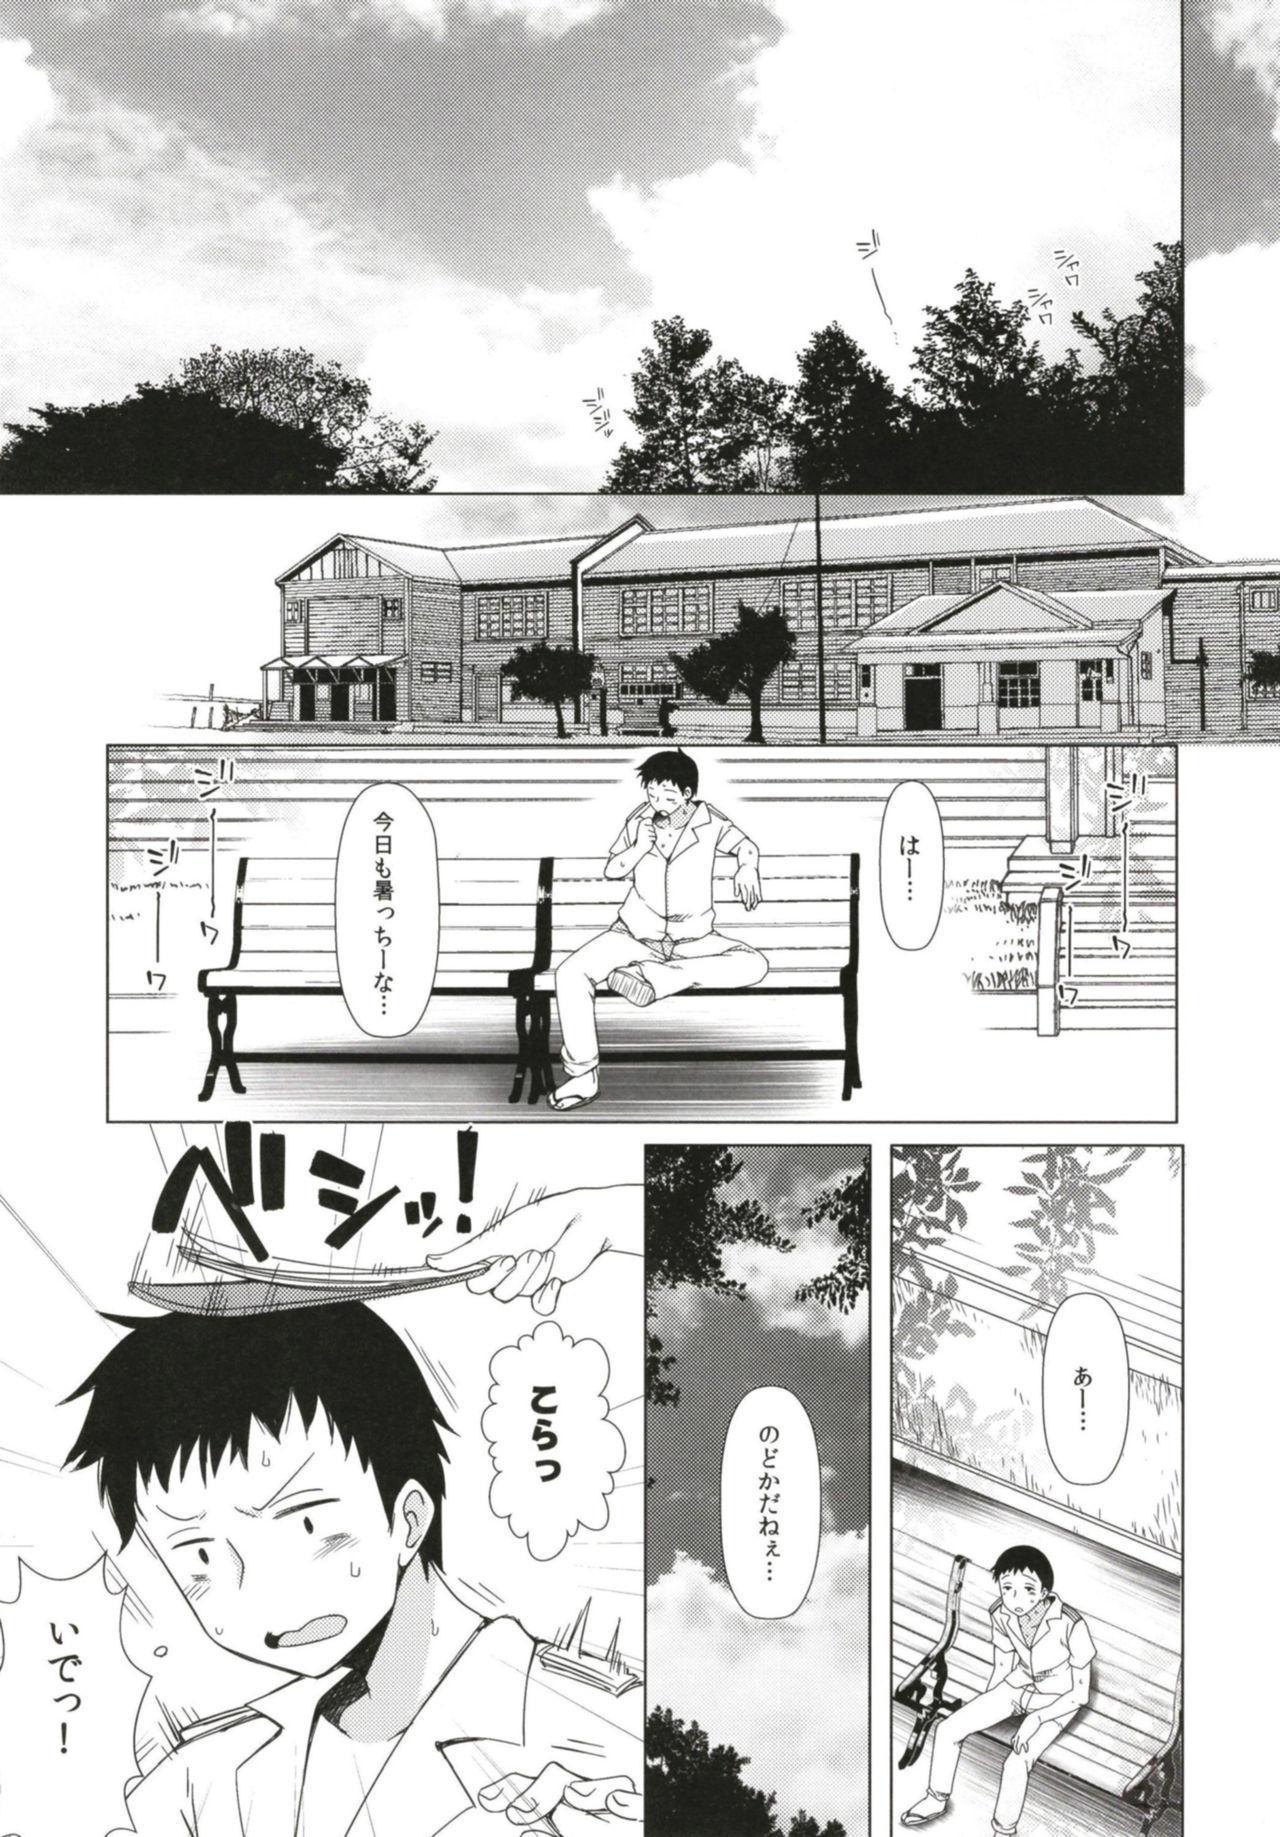 [French letter (Fujisaki Hikari)] Hitonatsu no Ayamachi -I-401 Soushuuhen- (Kantai Collection -KanColle-) [Digital] 4